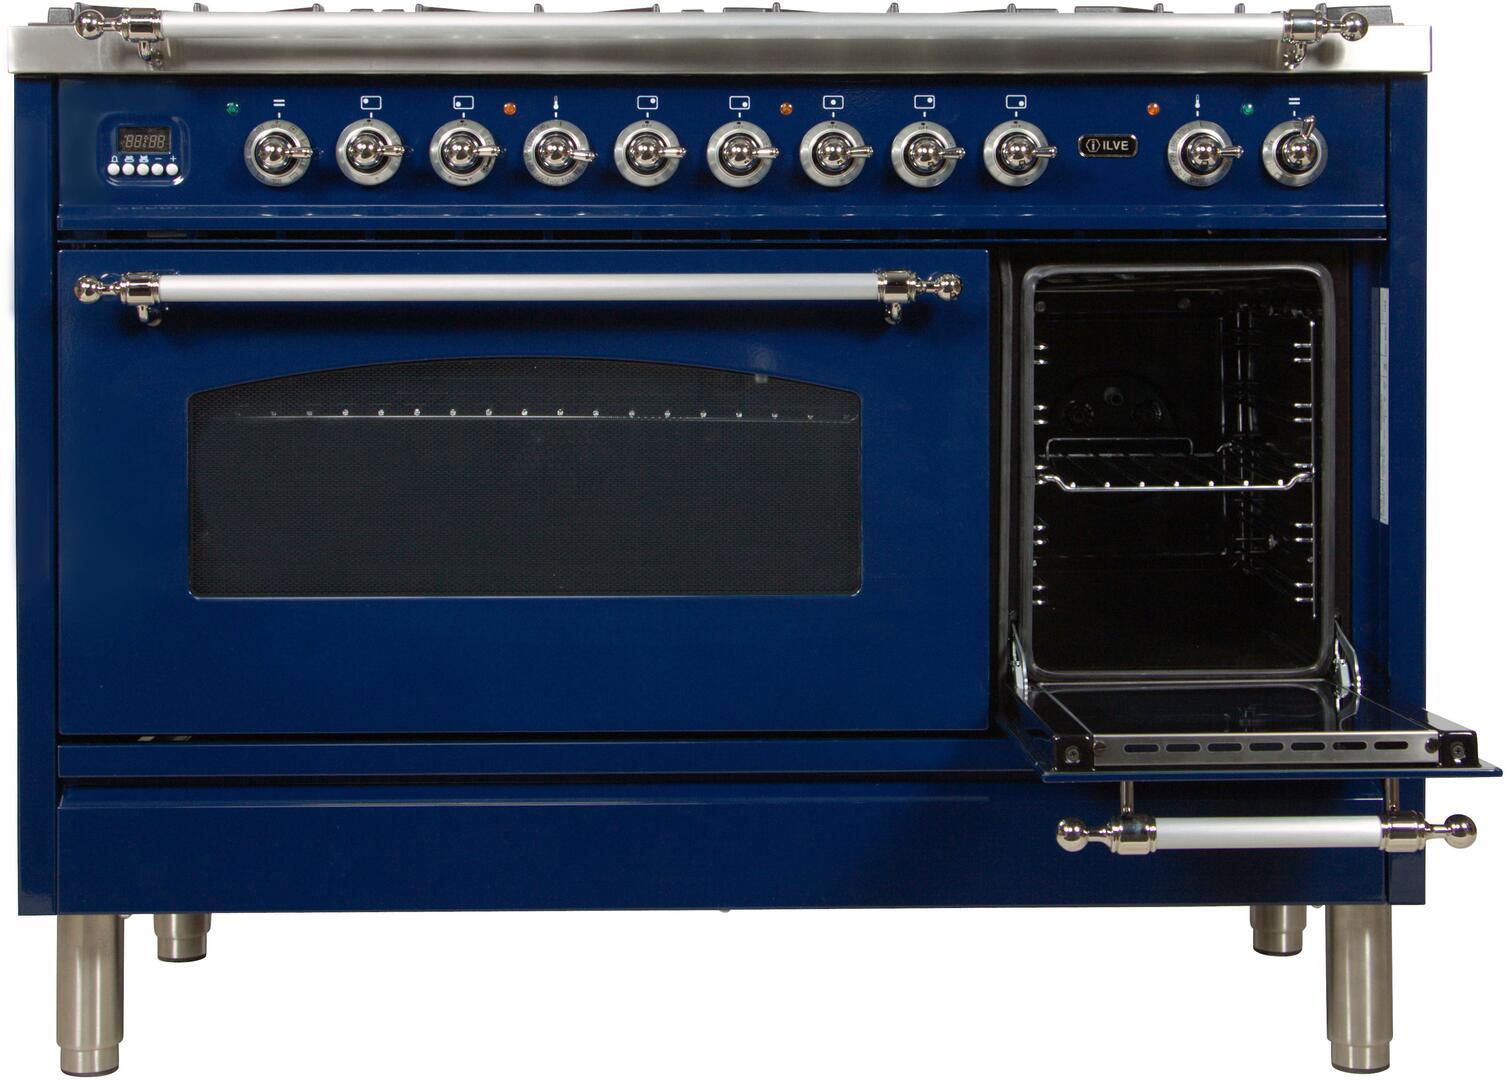 Ilve Nostalgie UPN120FDMPBLX Freestanding Dual Fuel Range Blue, UPN120FDMPBLX Secondary Oven Door Opened